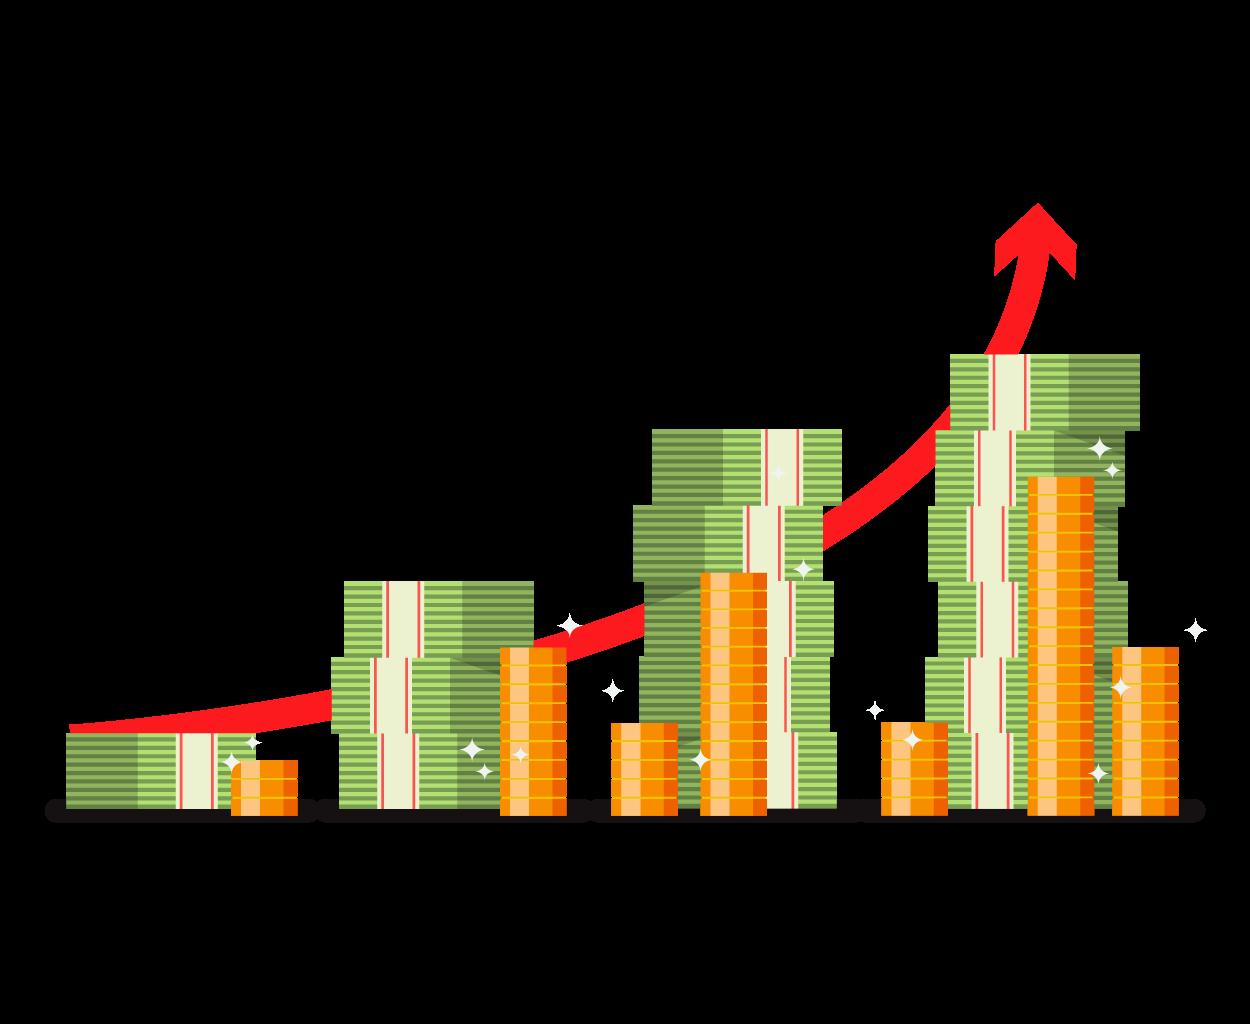 How-to-Make-More-Money10-Tips-for-Better-Billing